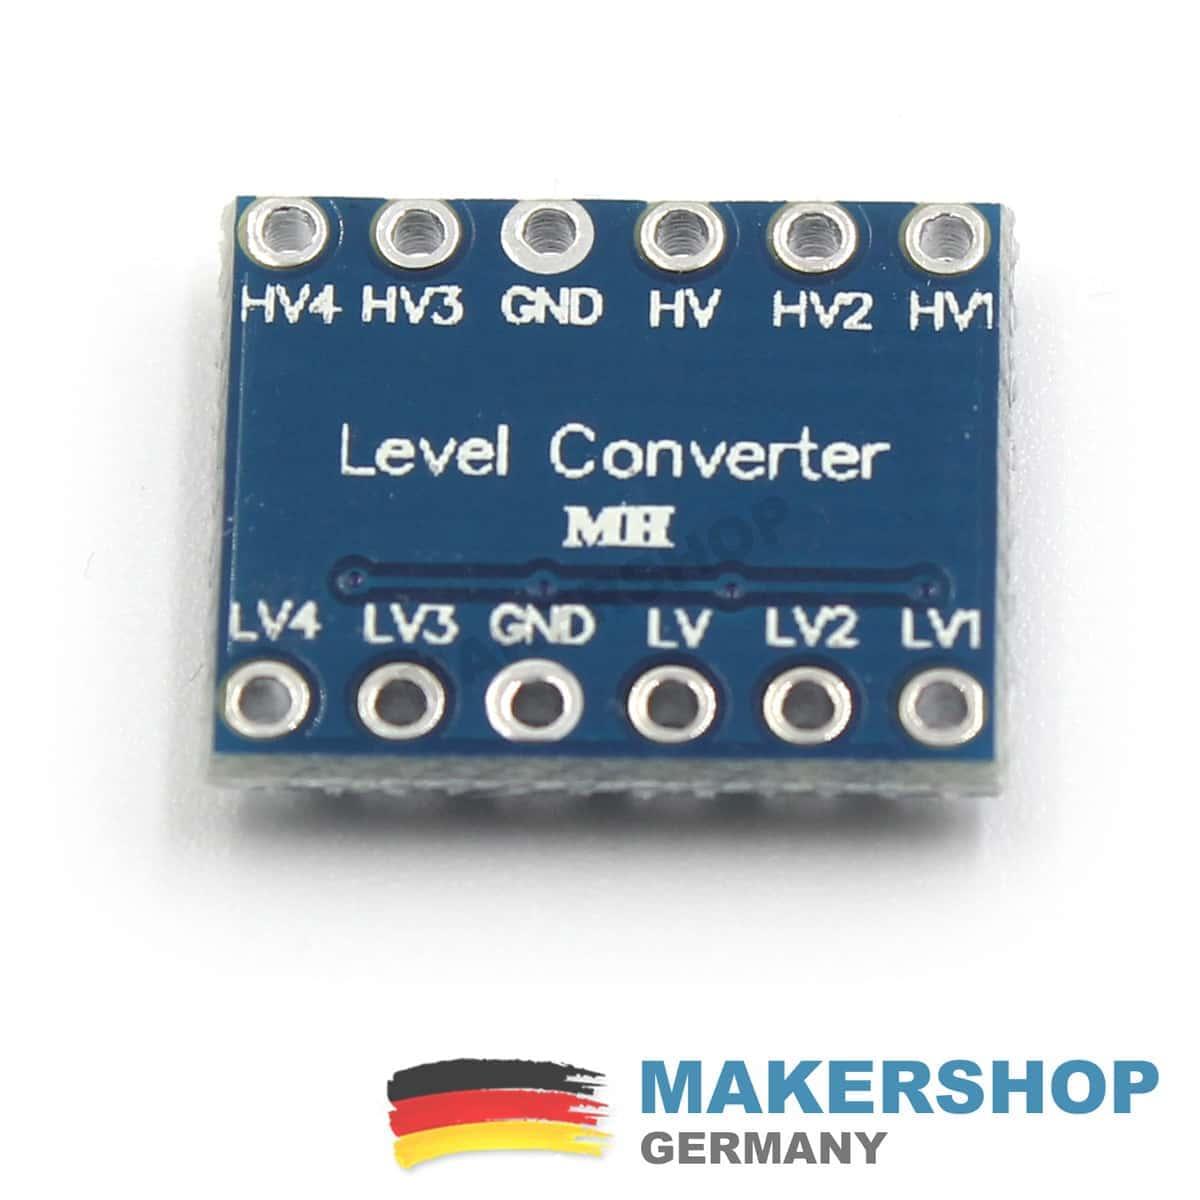 5 Stck 4 Kanal Pegelwandler Level Shifter Konverter I2c 5v 33v To And Electronics Components Nur 375 Inkl Mwst Zzgl Versand